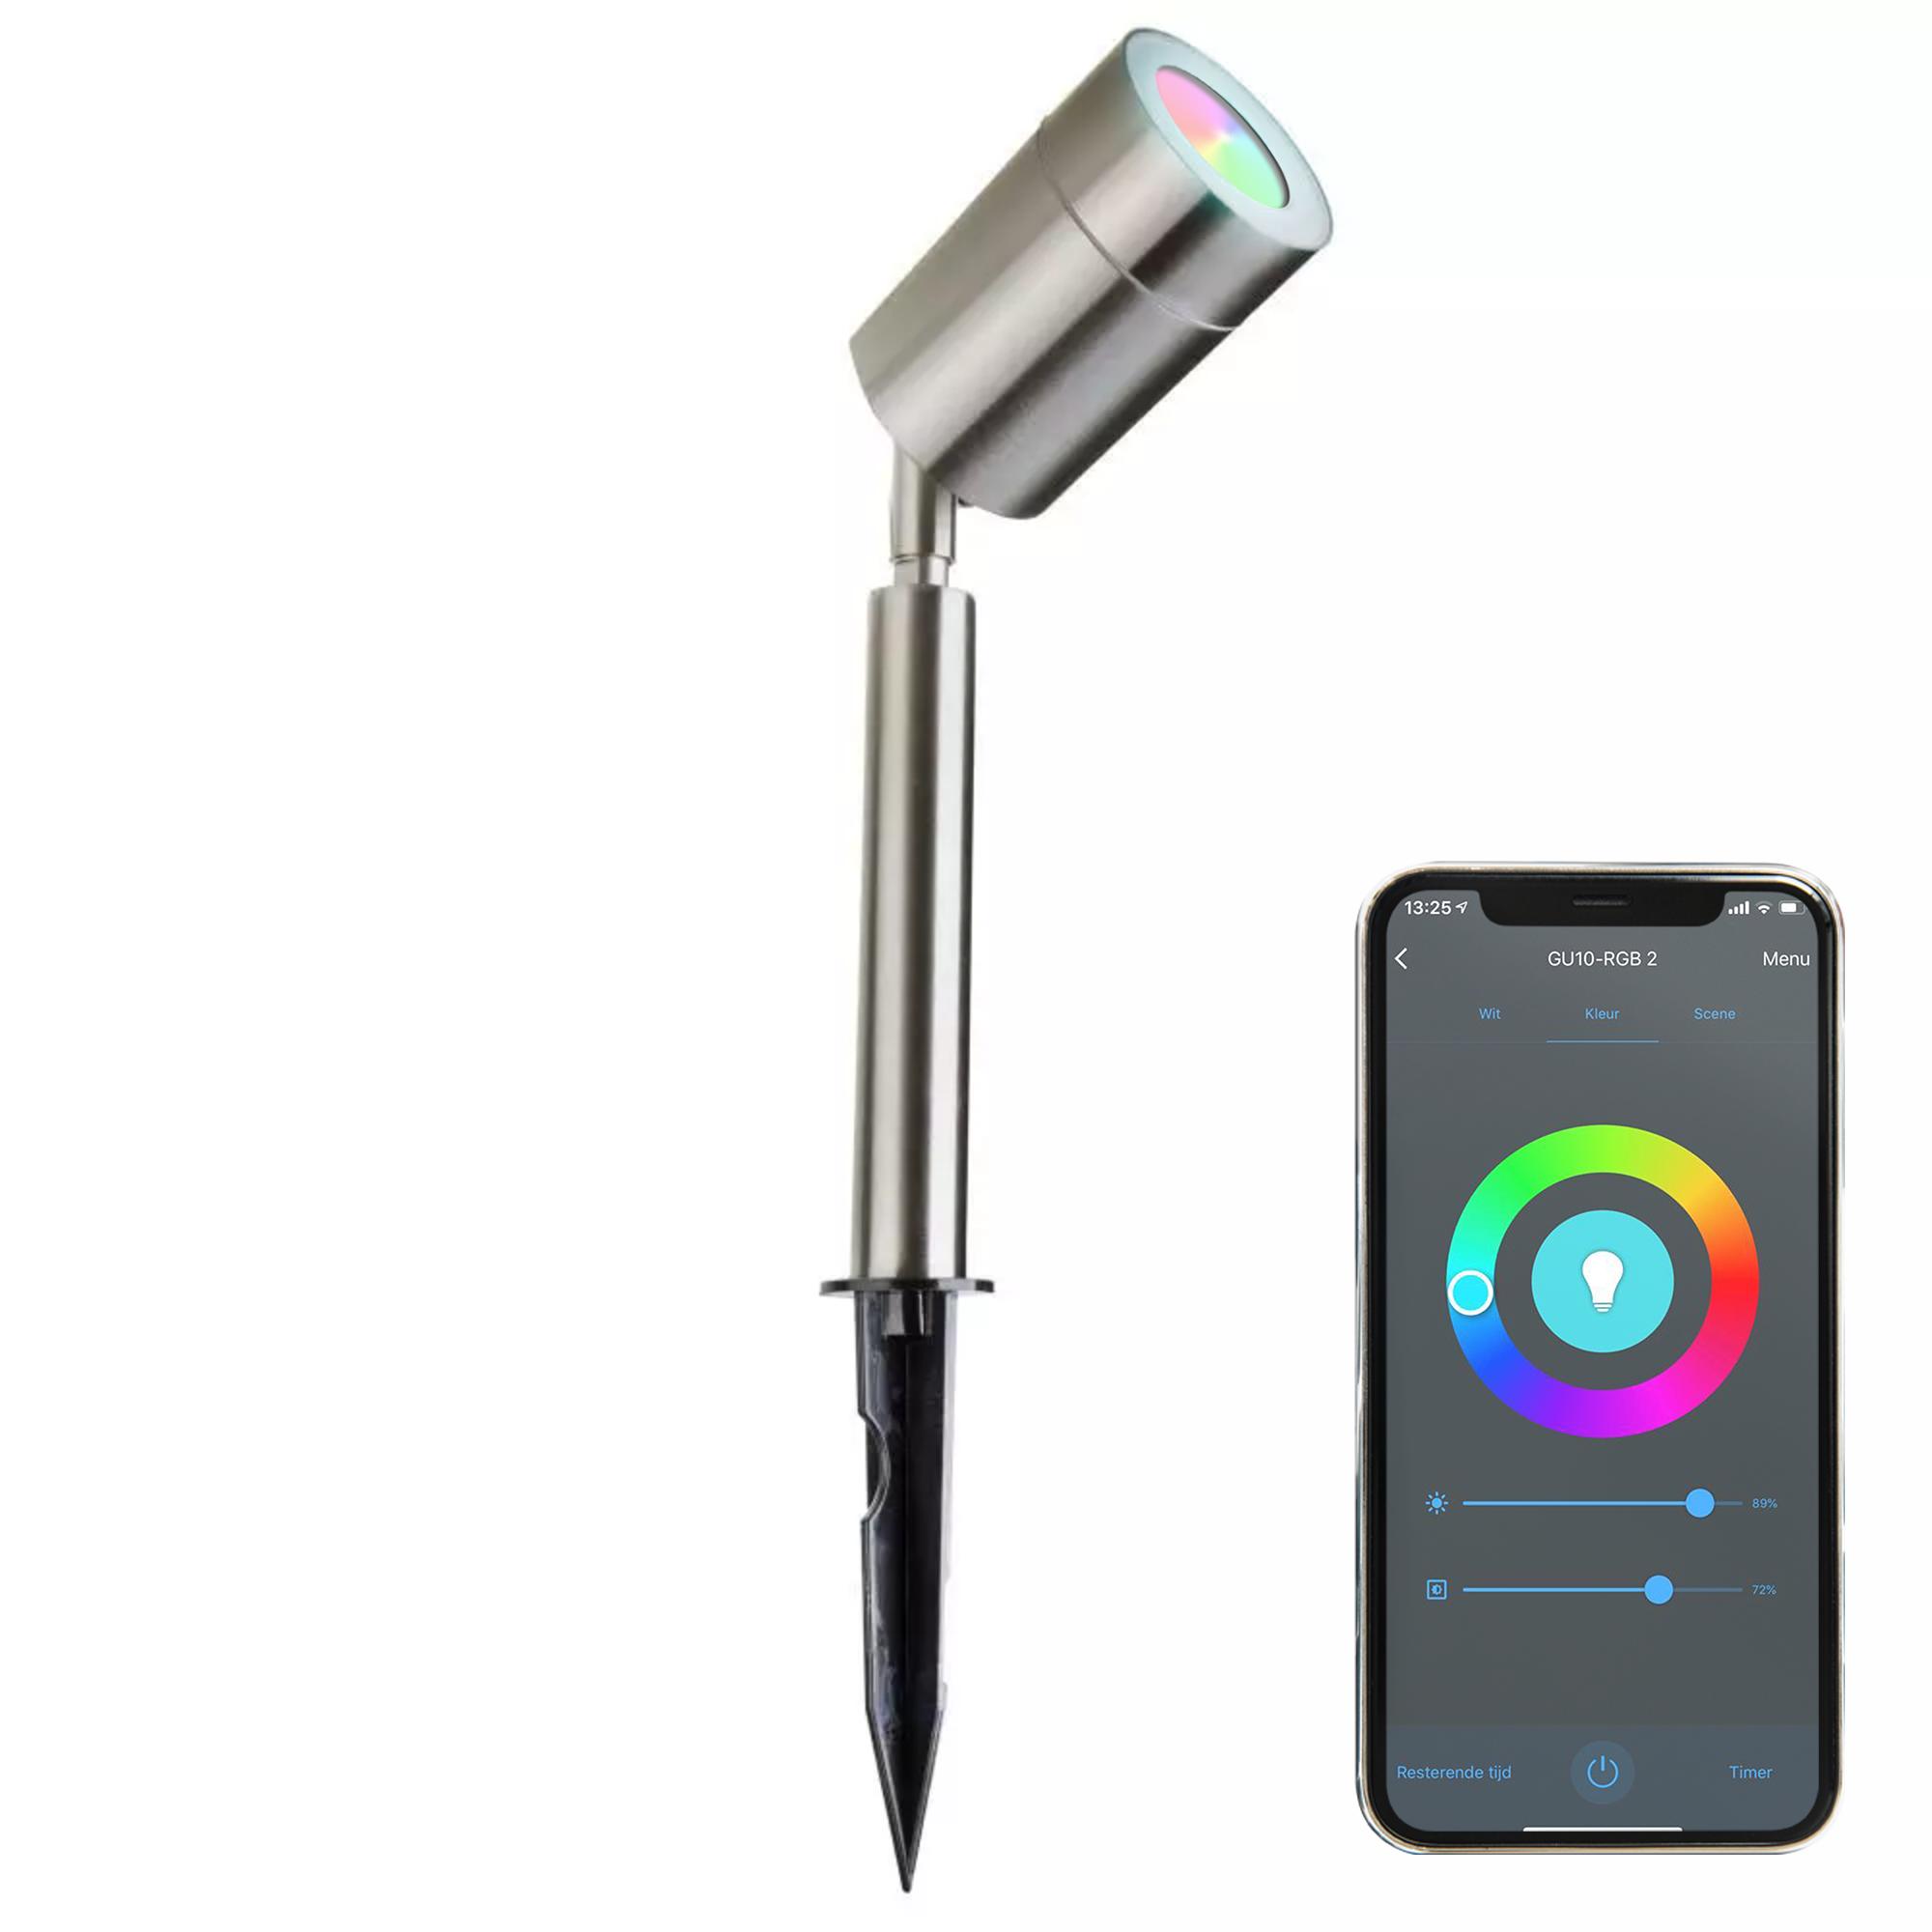 Smart WiFi LED Prikspot – IP44 - GU10 Fitting - RVS - SALE: 13%